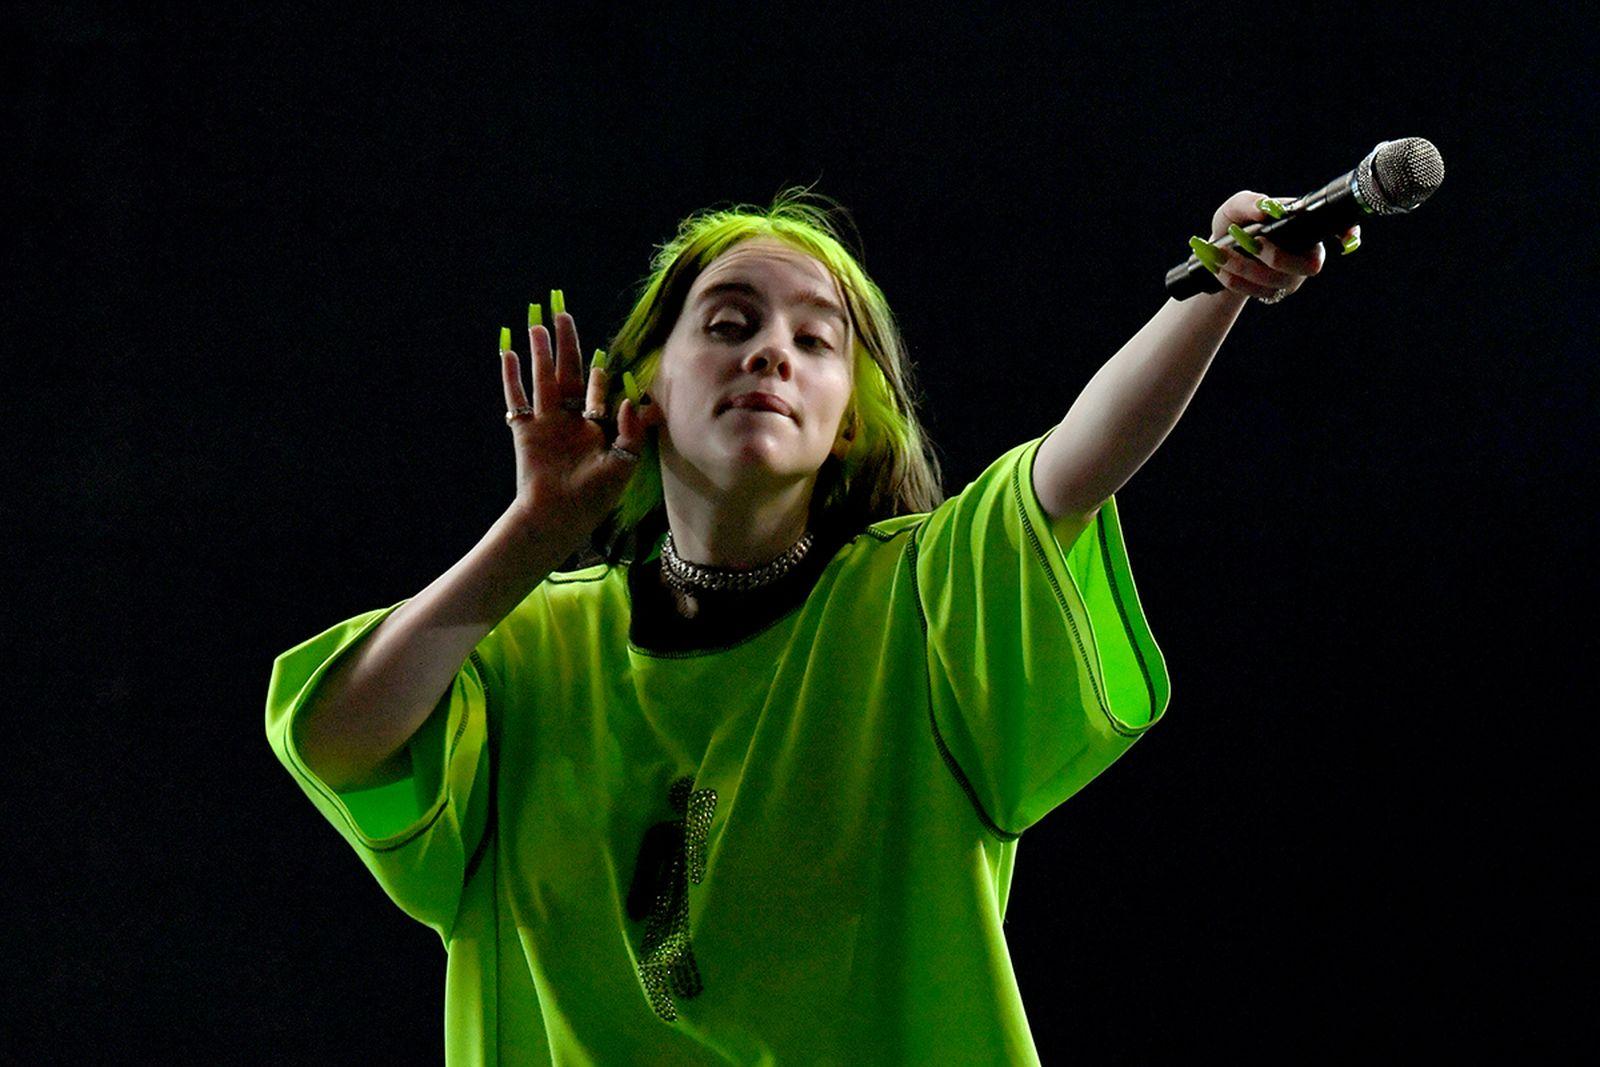 Billie Eilish performing green shirt